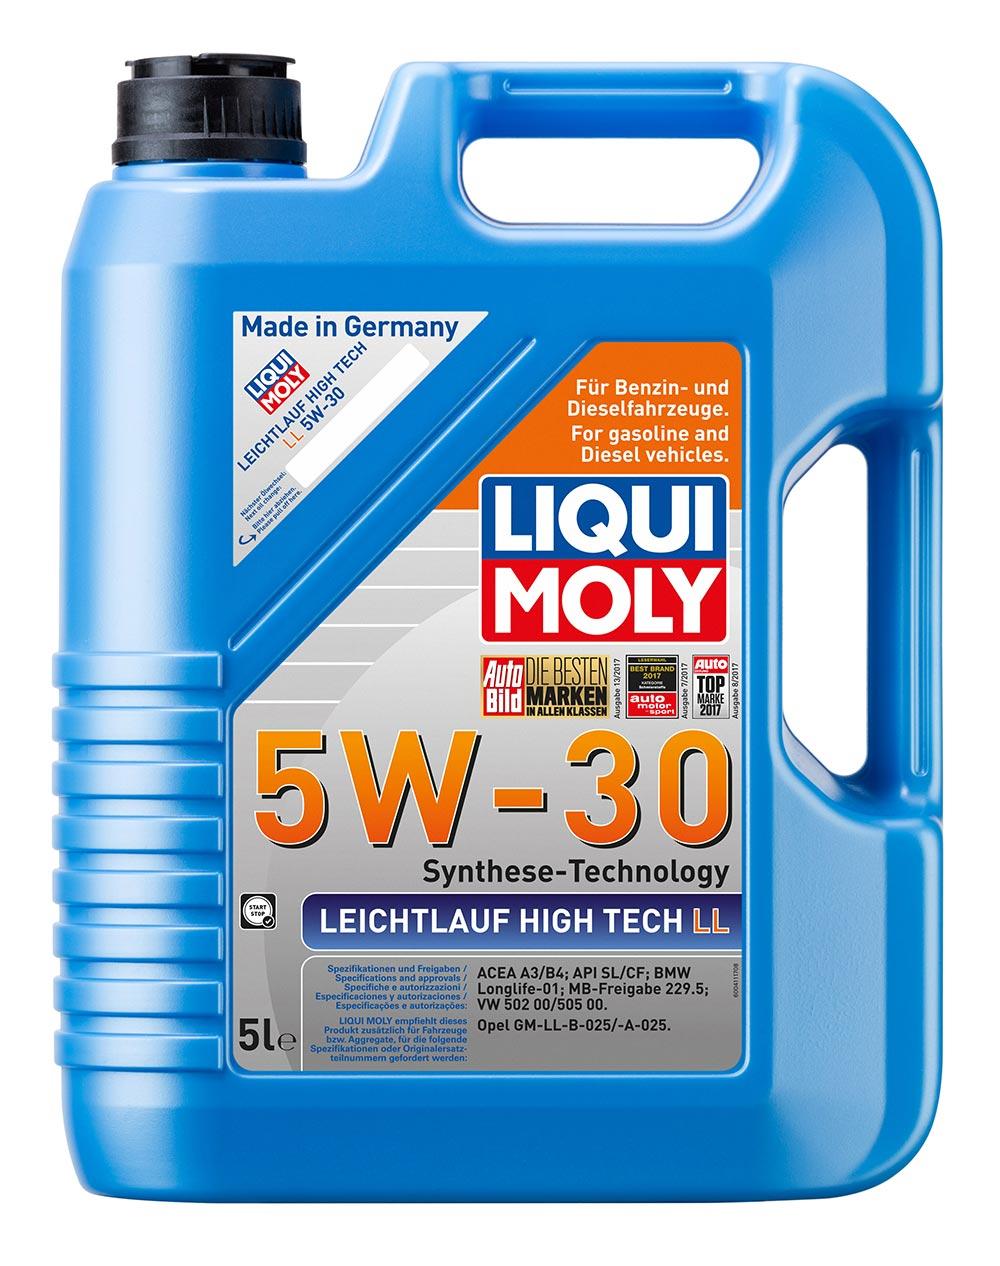 Масло моторное синт.5W30 Leichtlauf High Tech LL5л API SL/CF. A3/B4. BMW Longlif